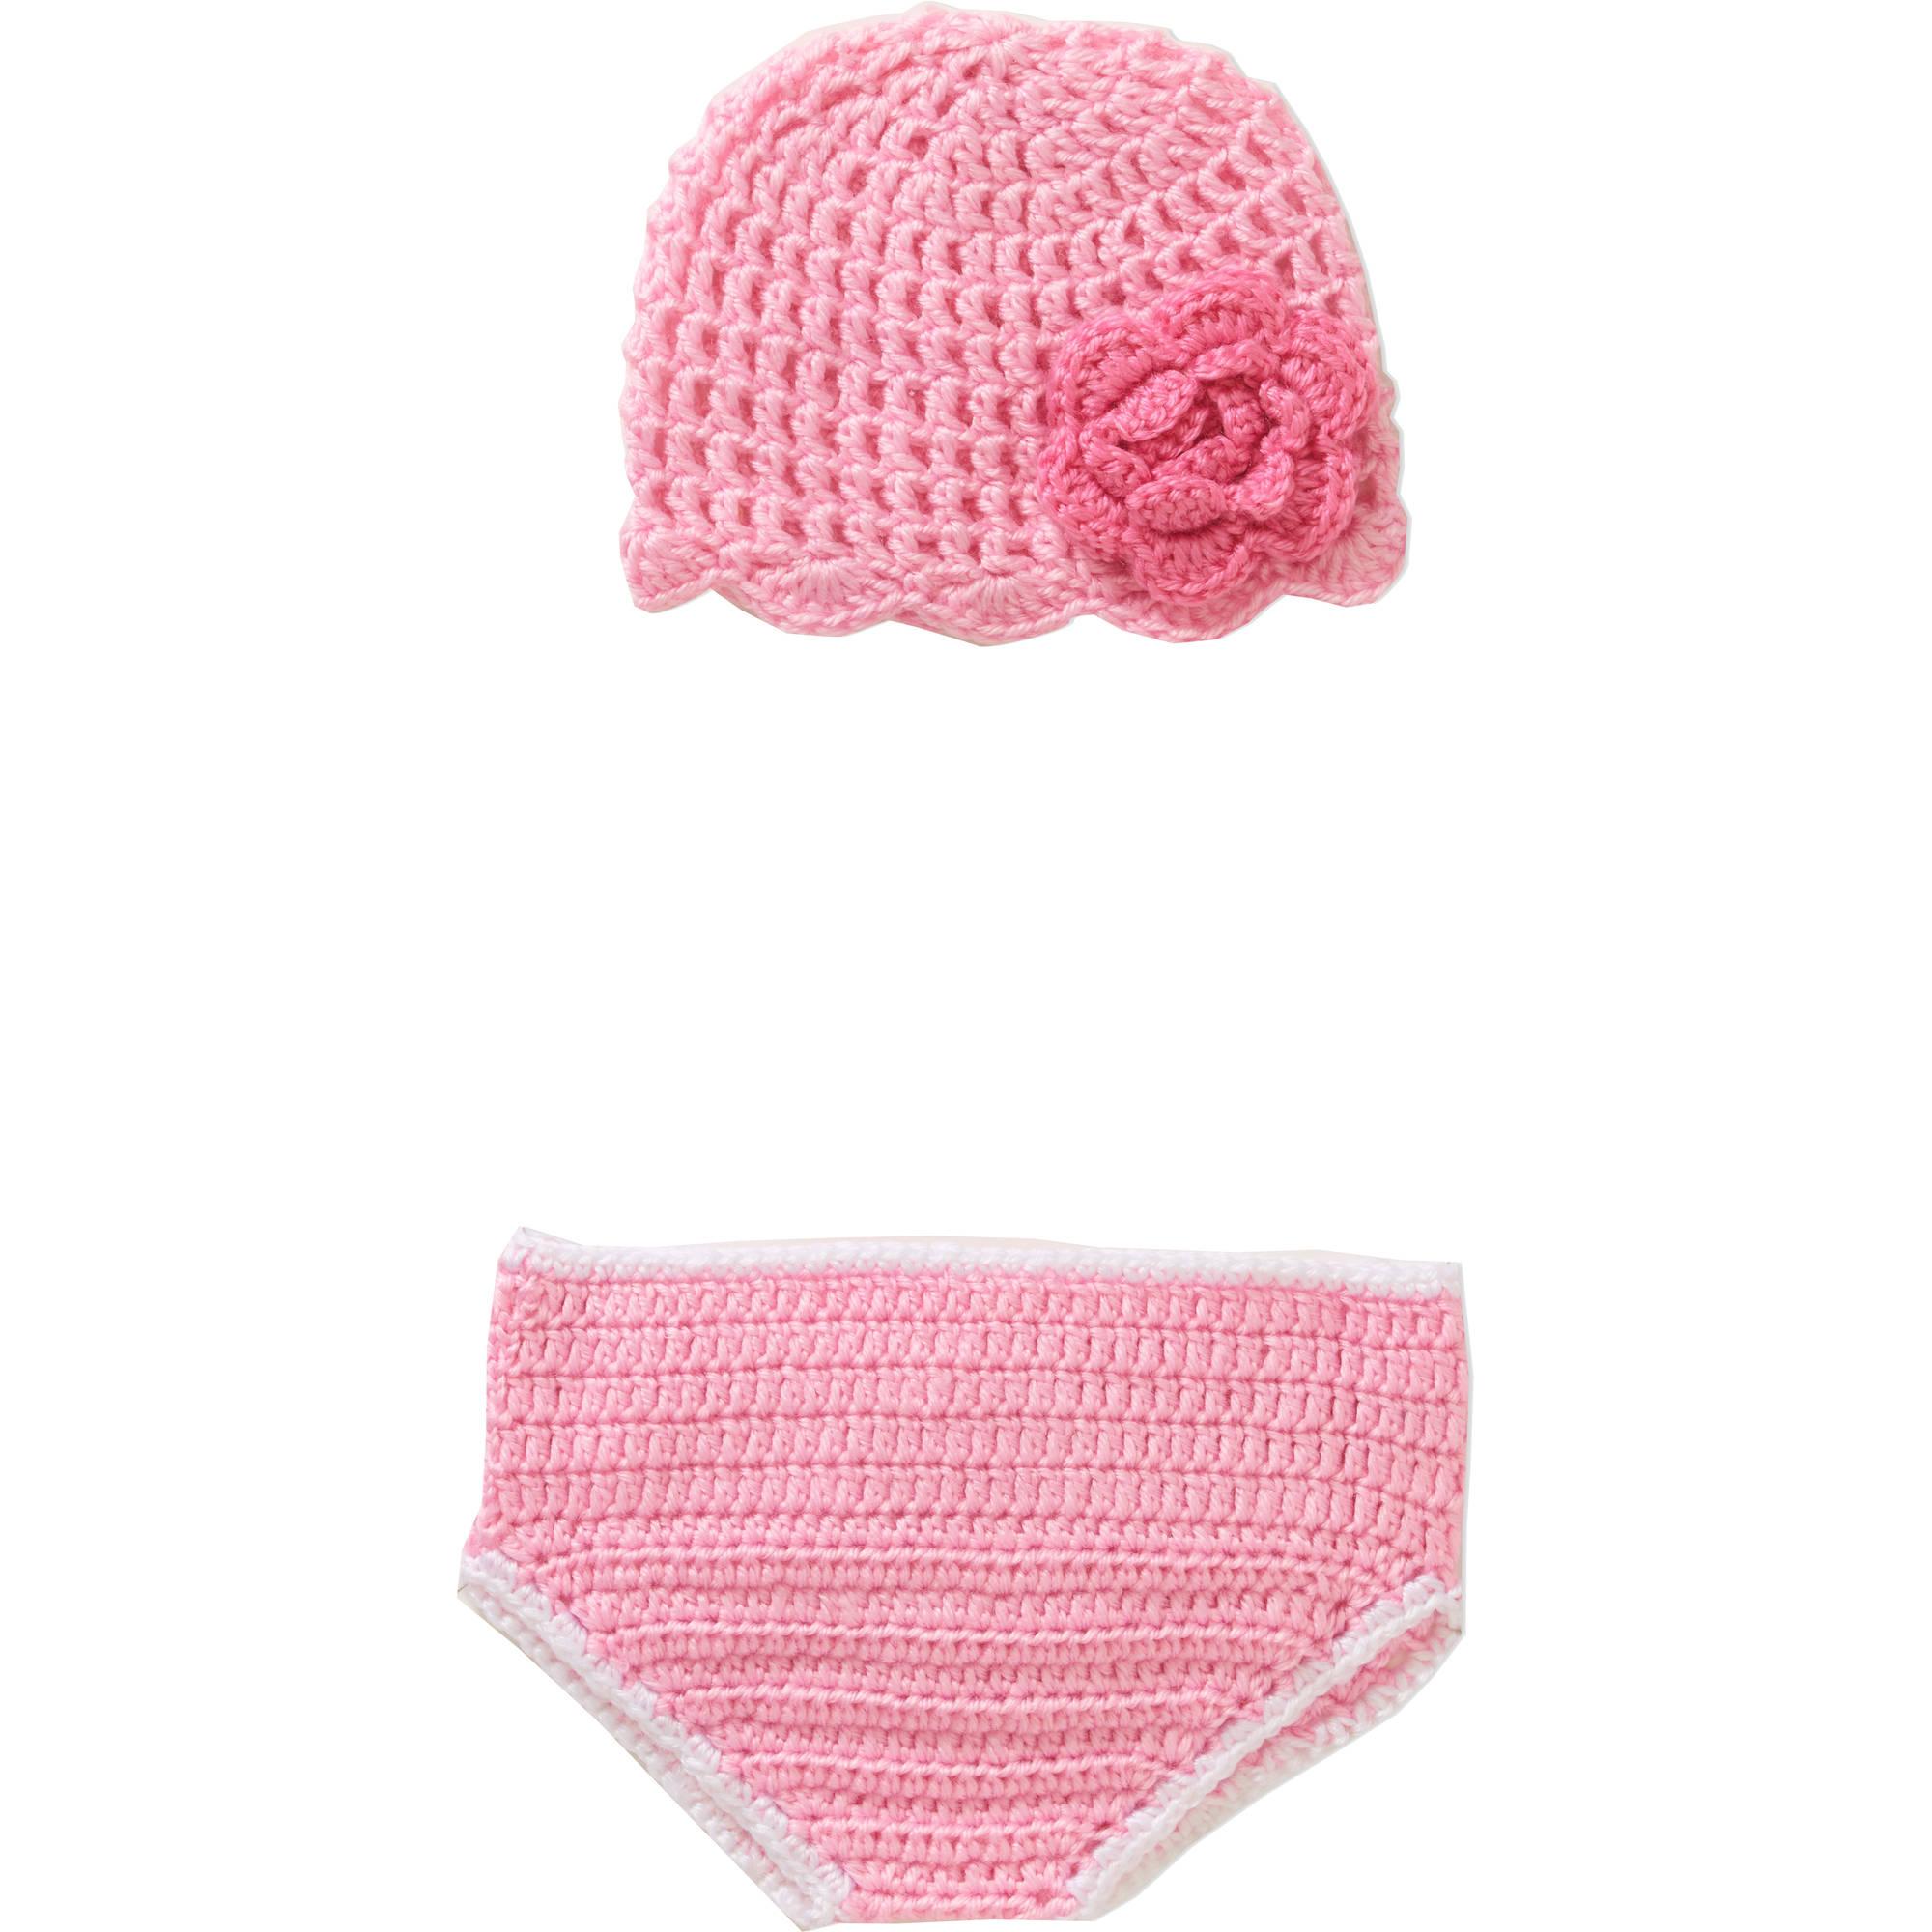 Newborn Baby Crochet Pink Flower Photo Opp 2Pc Set